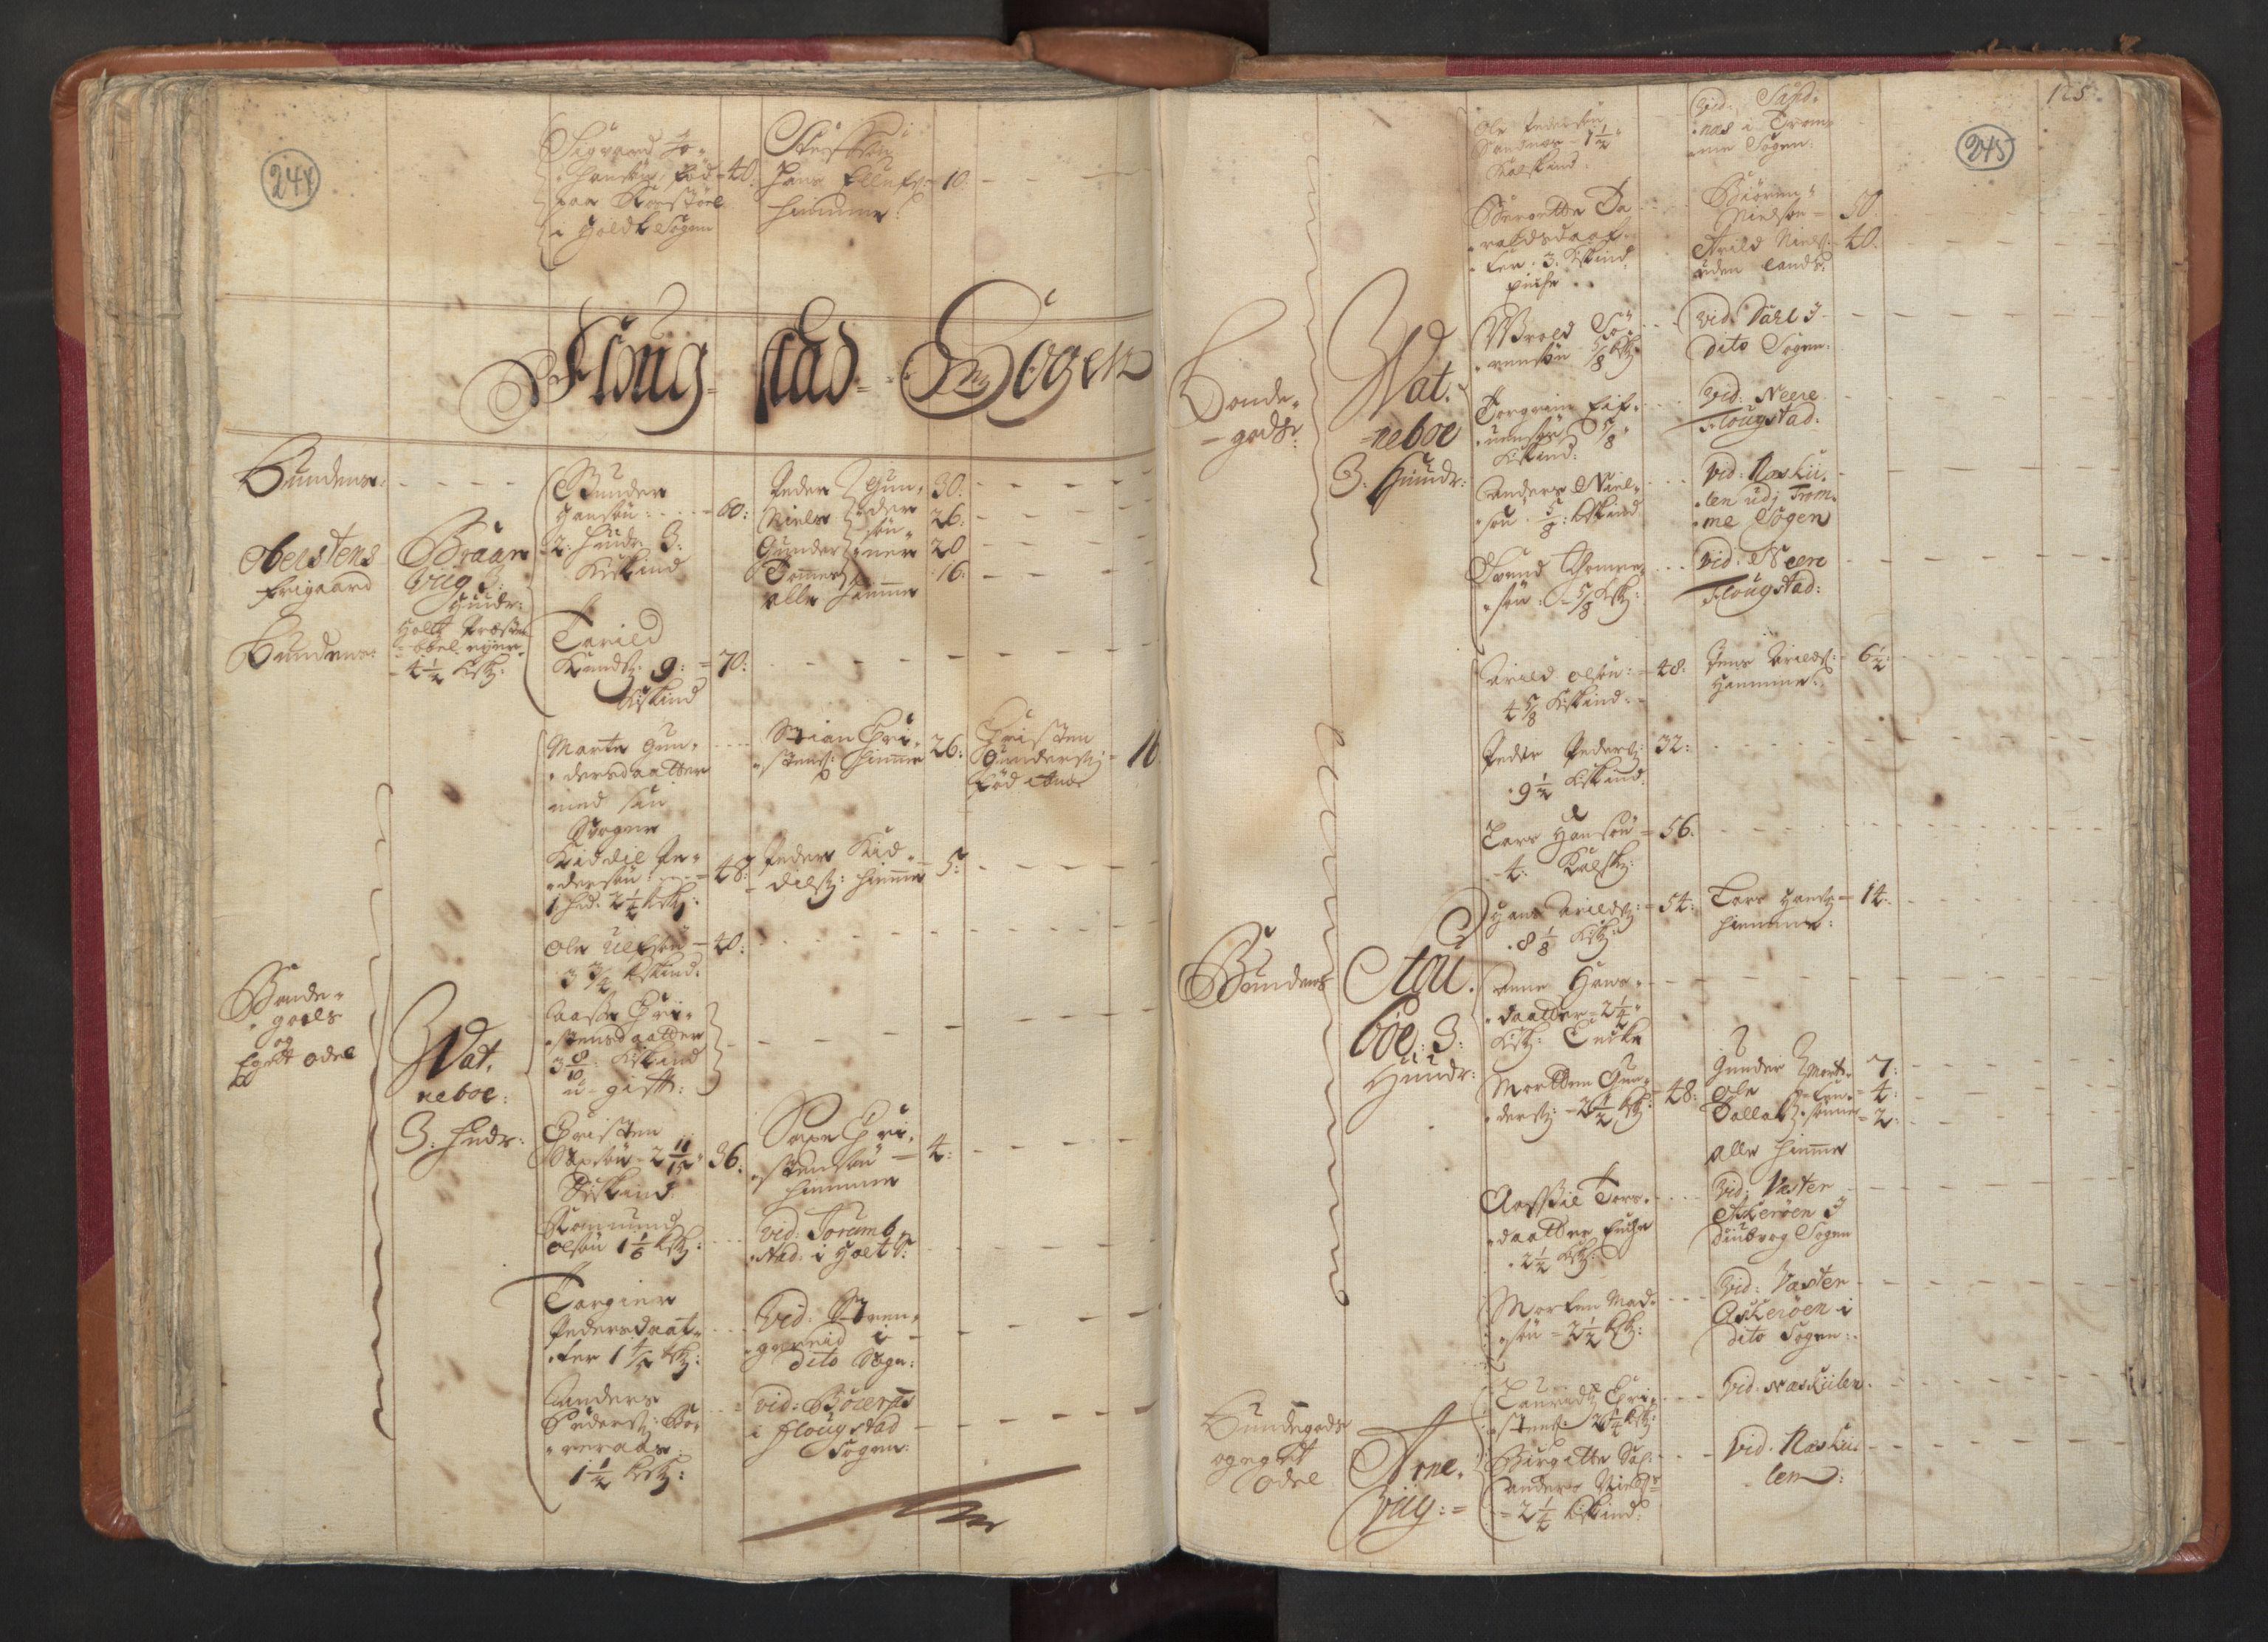 RA, Manntallet 1701, nr. 3: Nedenes fogderi, 1701, s. 244-245